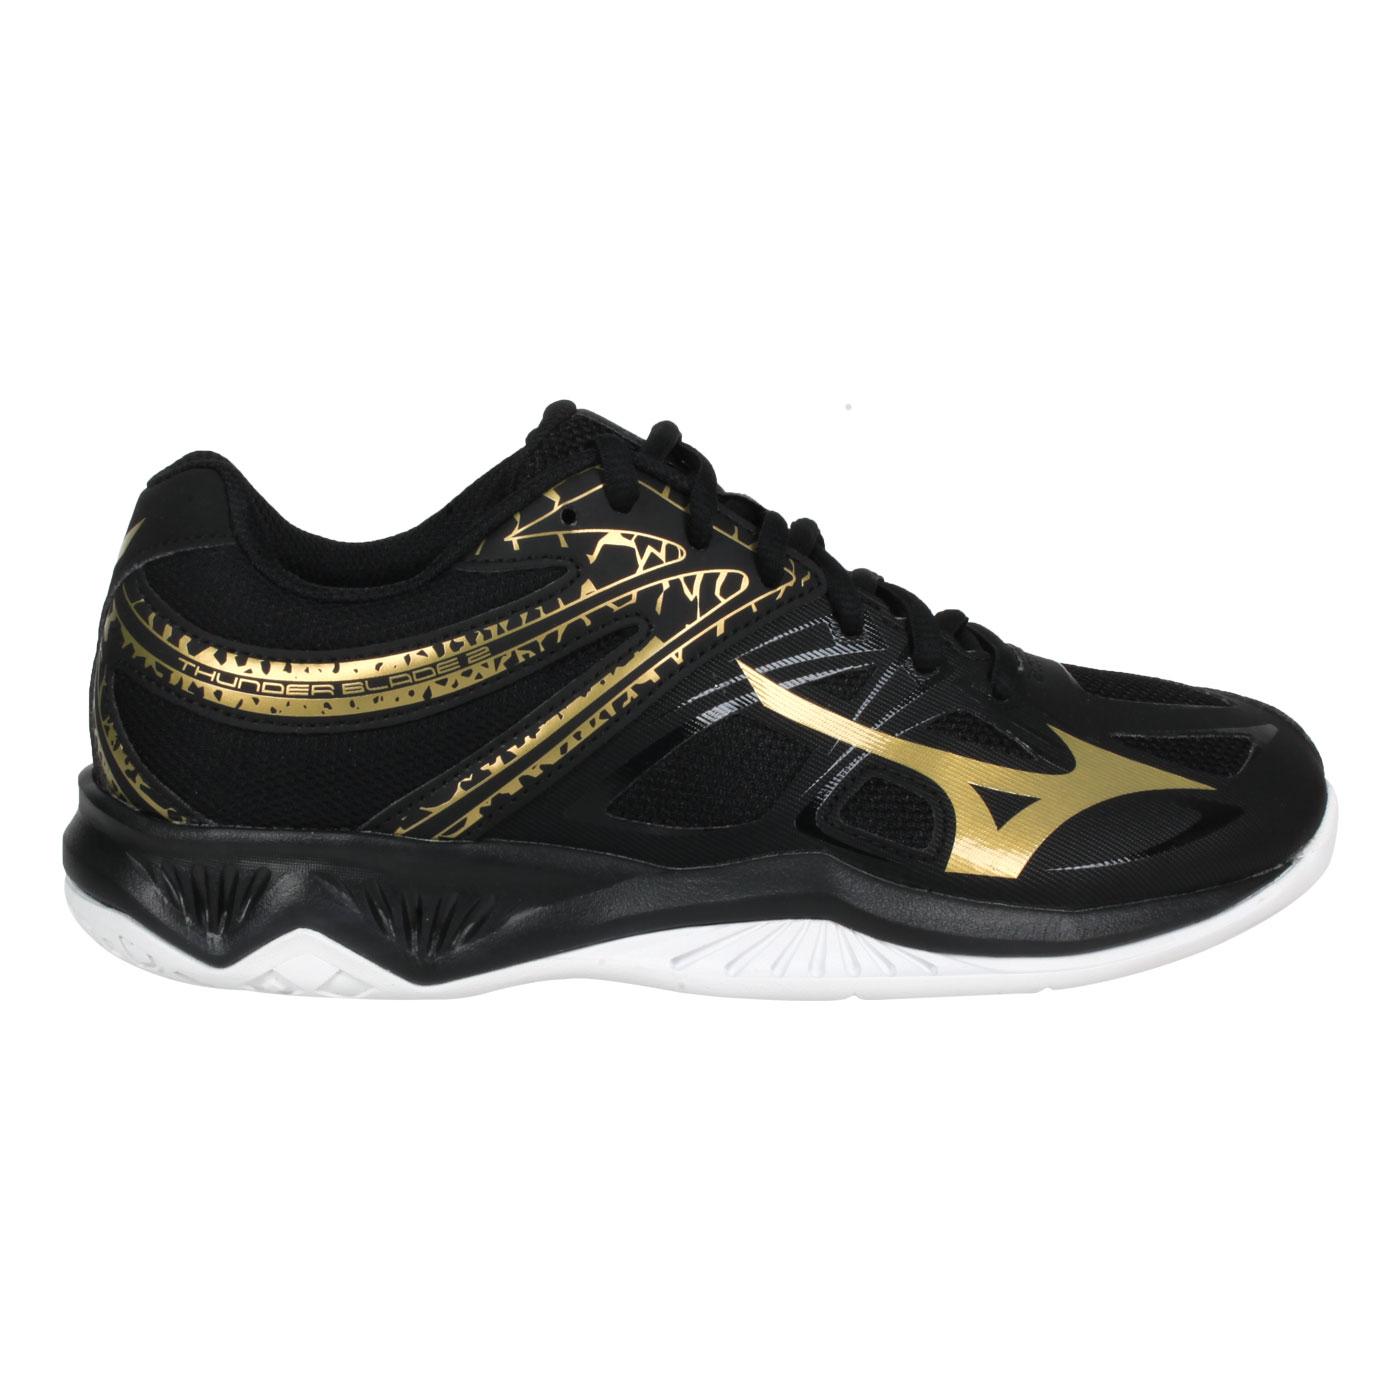 MIZUNO 男女排球鞋  @THUNDER BLADE 2@V1GA197052 - 黑金